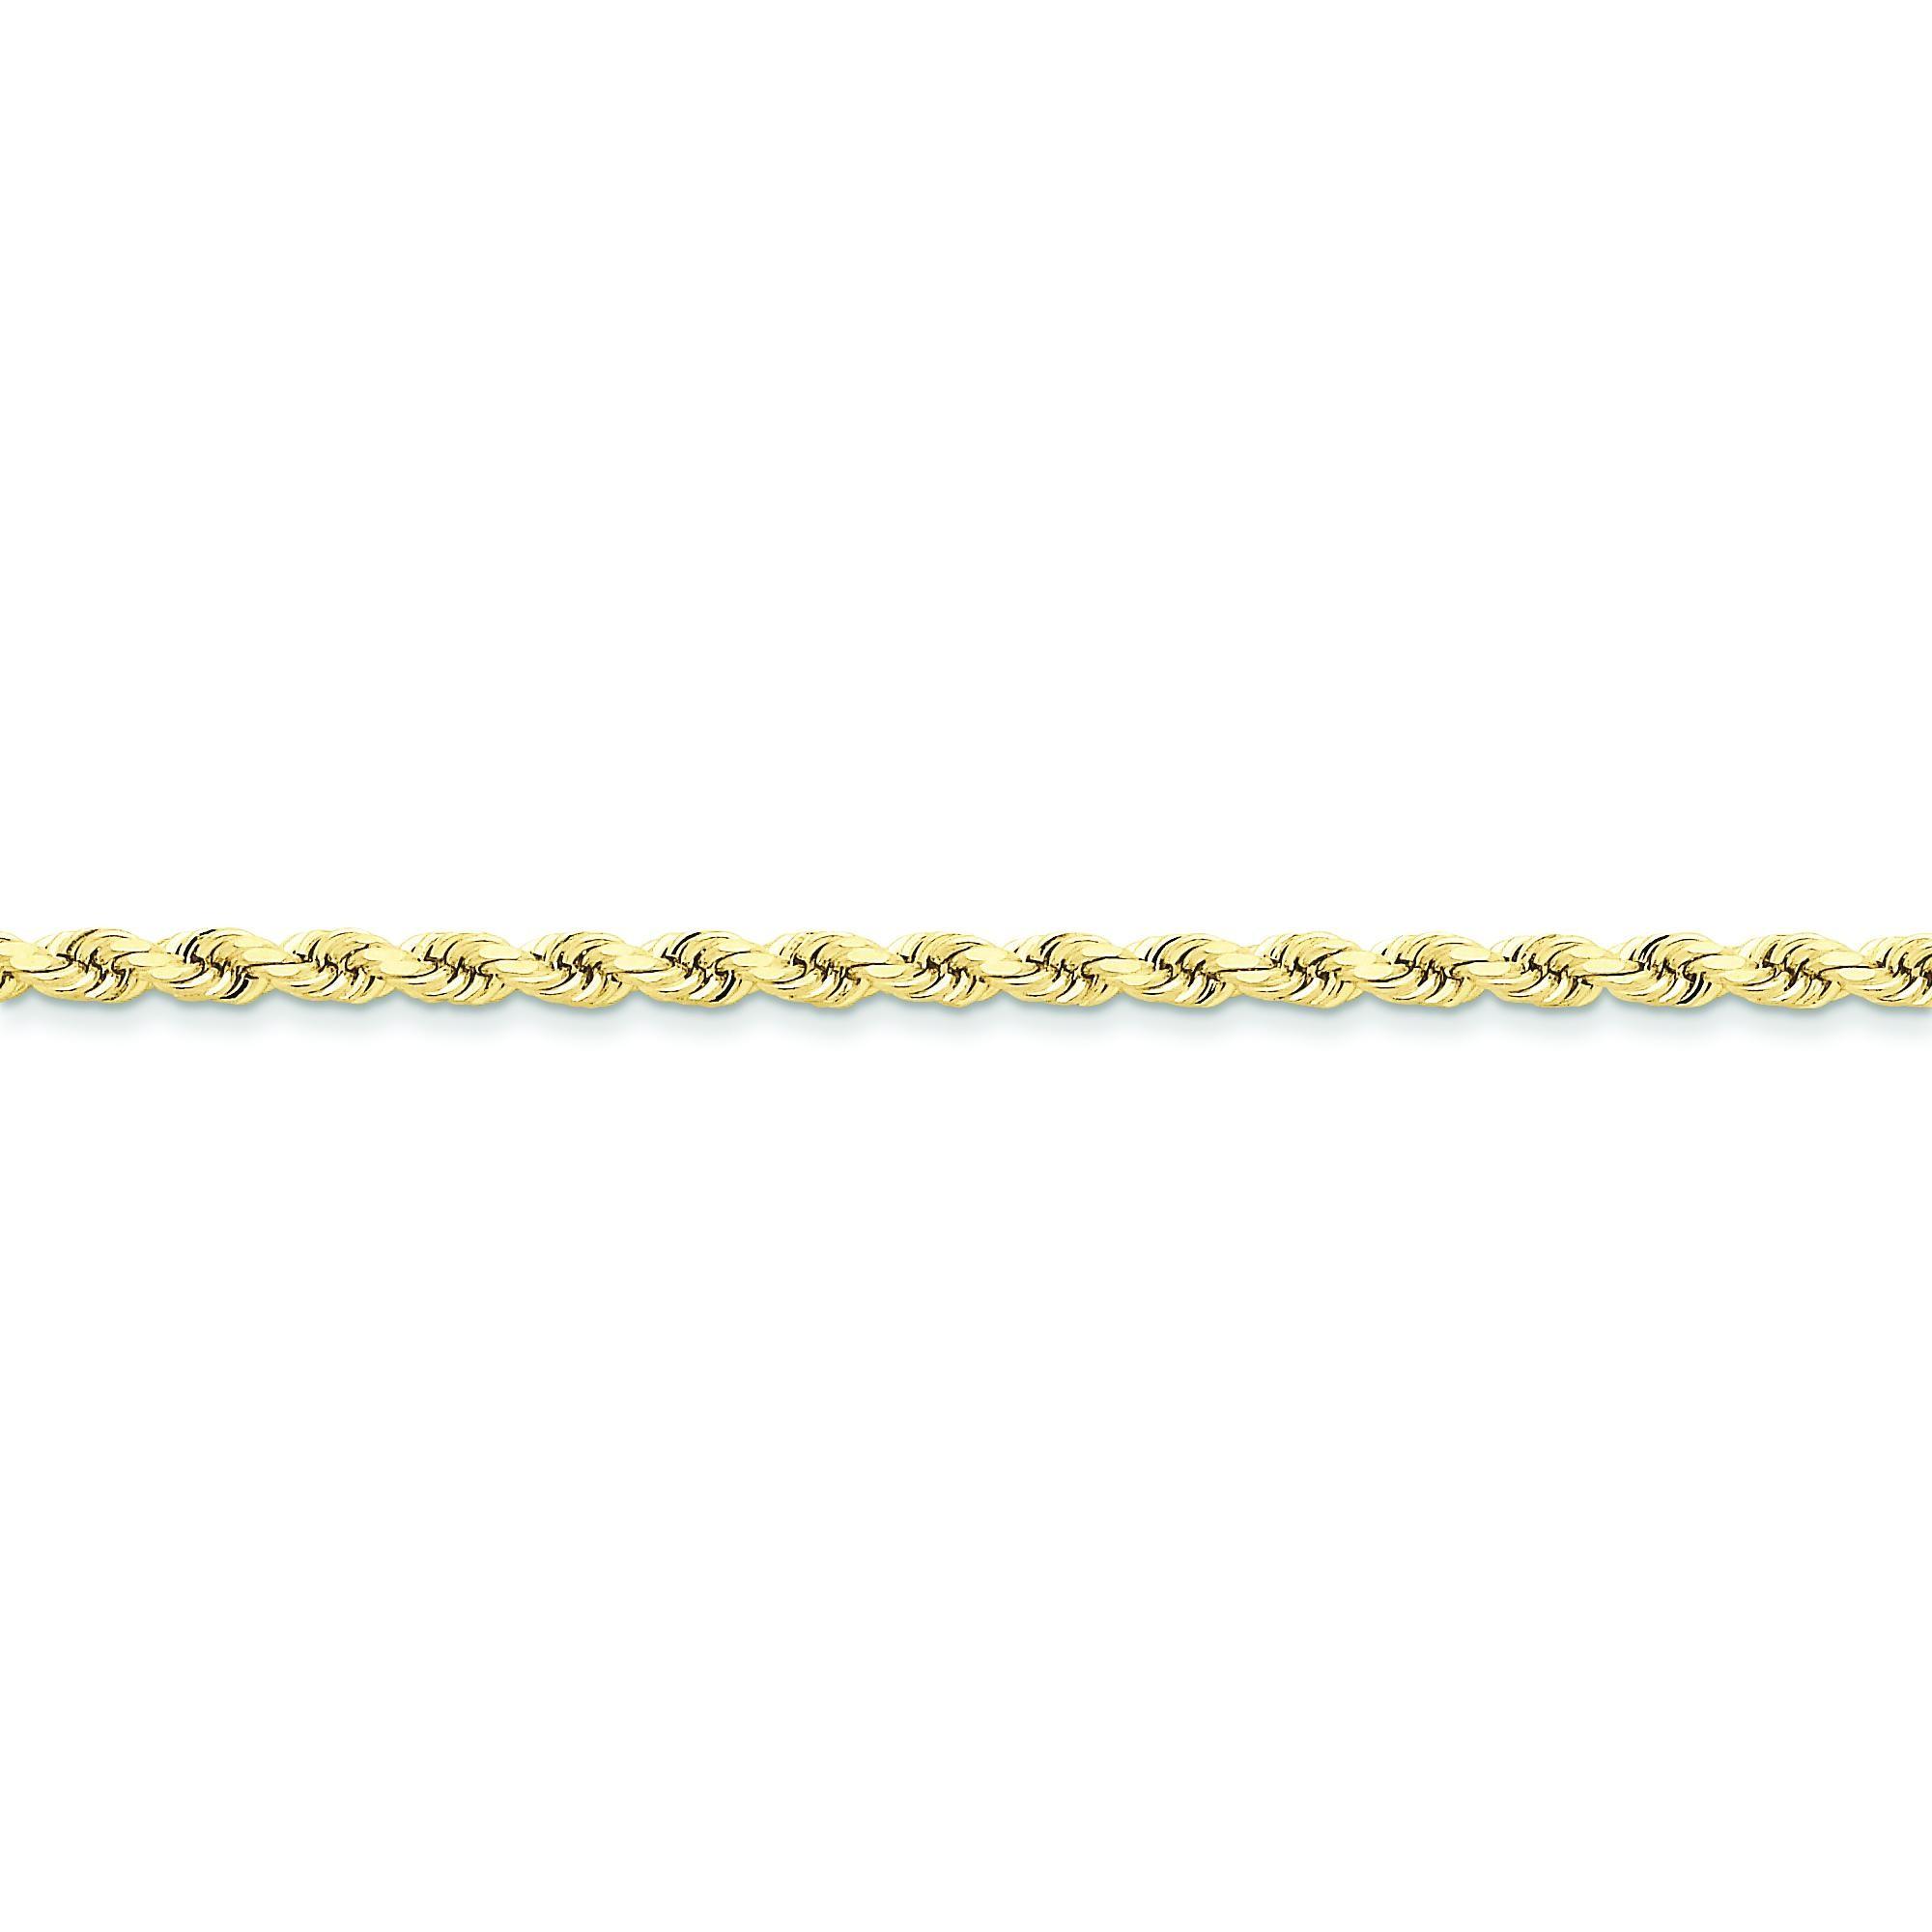 10k Yellow Gold 8 inch 3.50 mm Handmade Rope Chain Bracelet